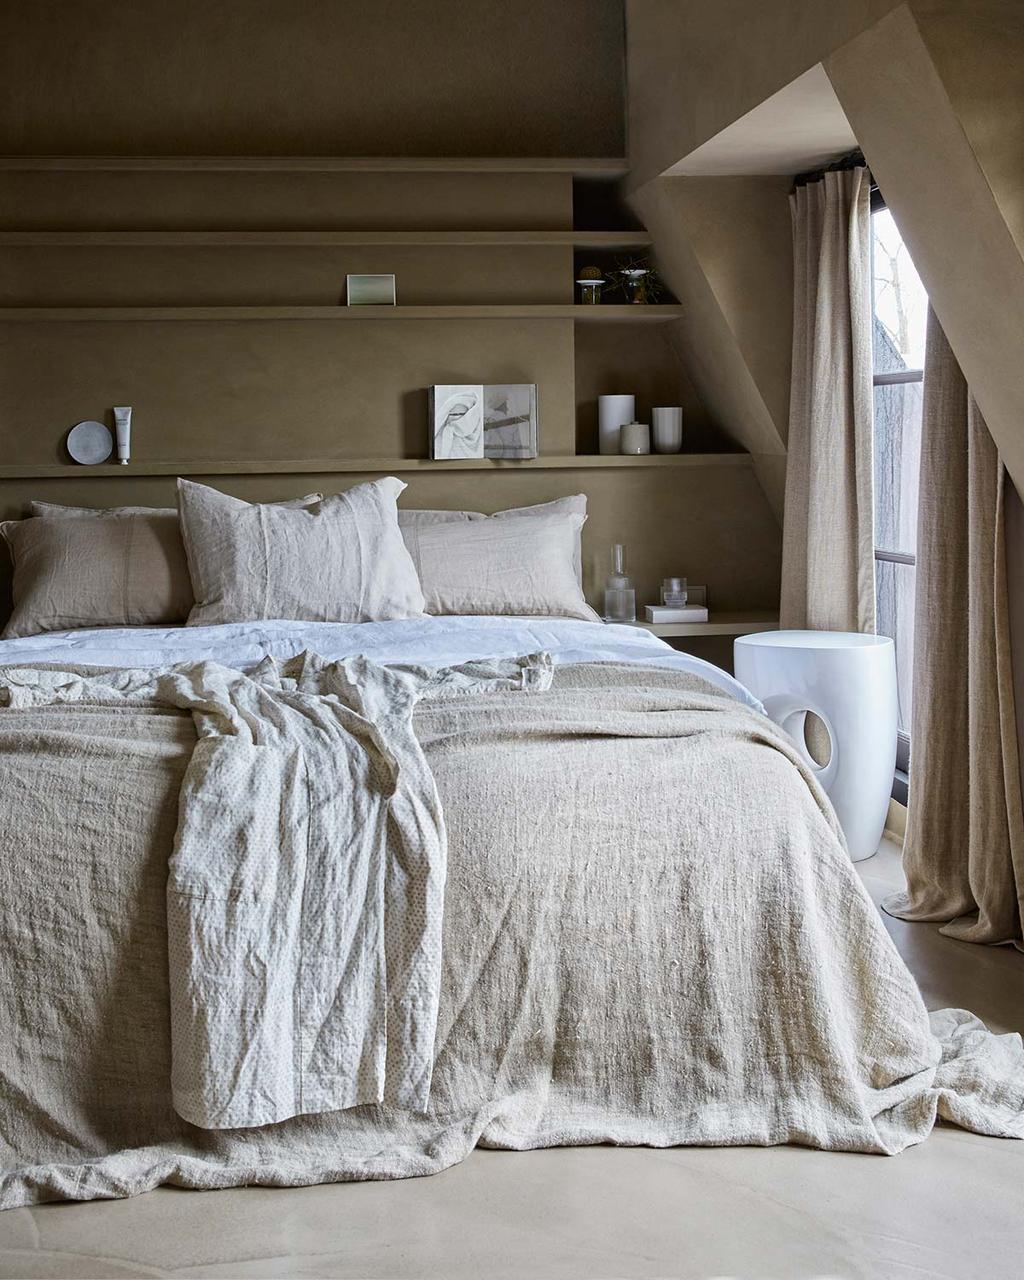 Basic slaapkamer met materialen als linnen, vlas, jute, breisels en keramiek